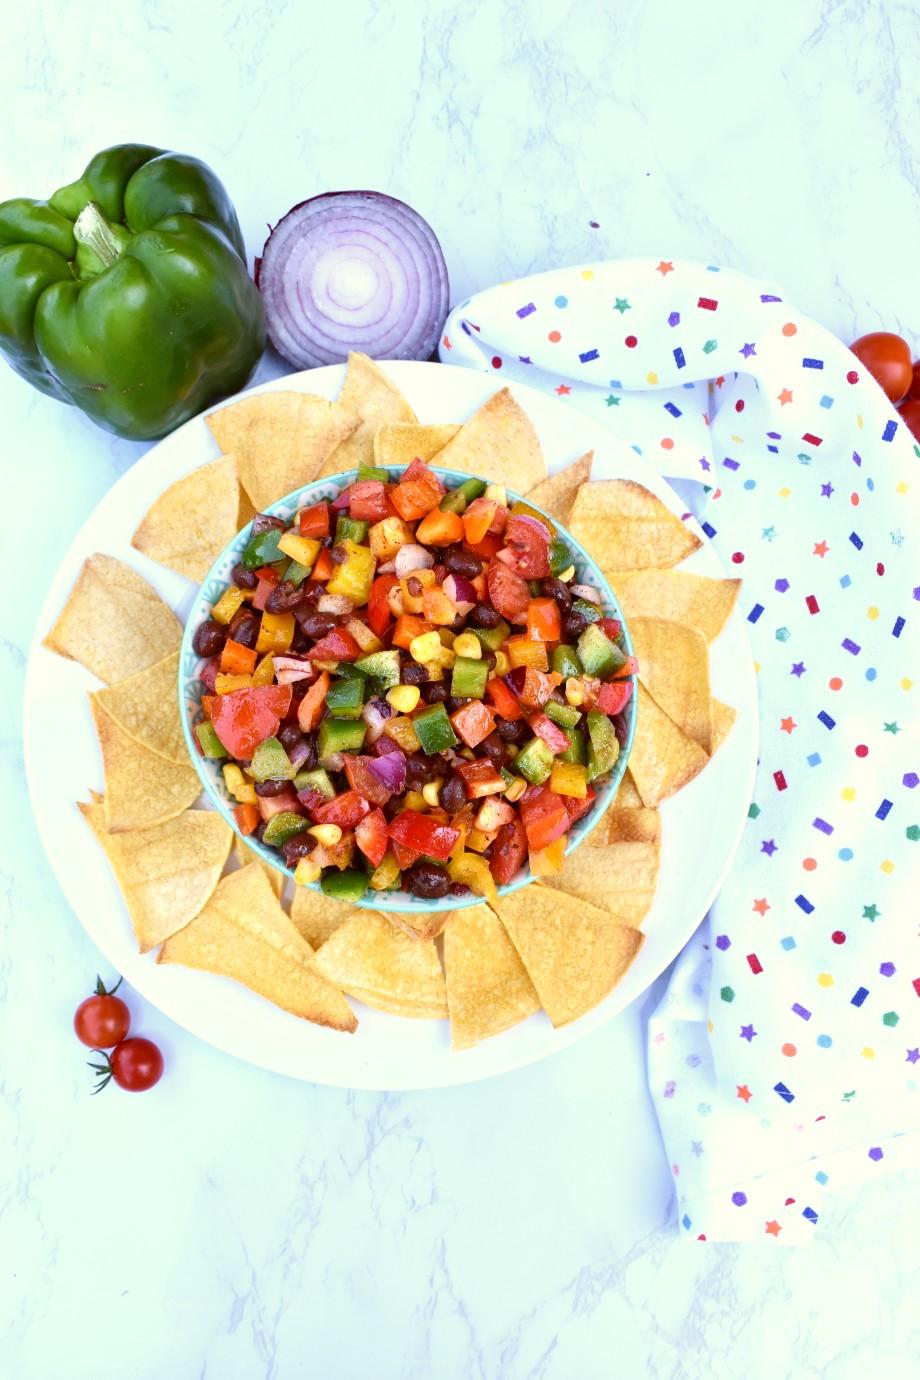 Black bean salad with tortilla chips